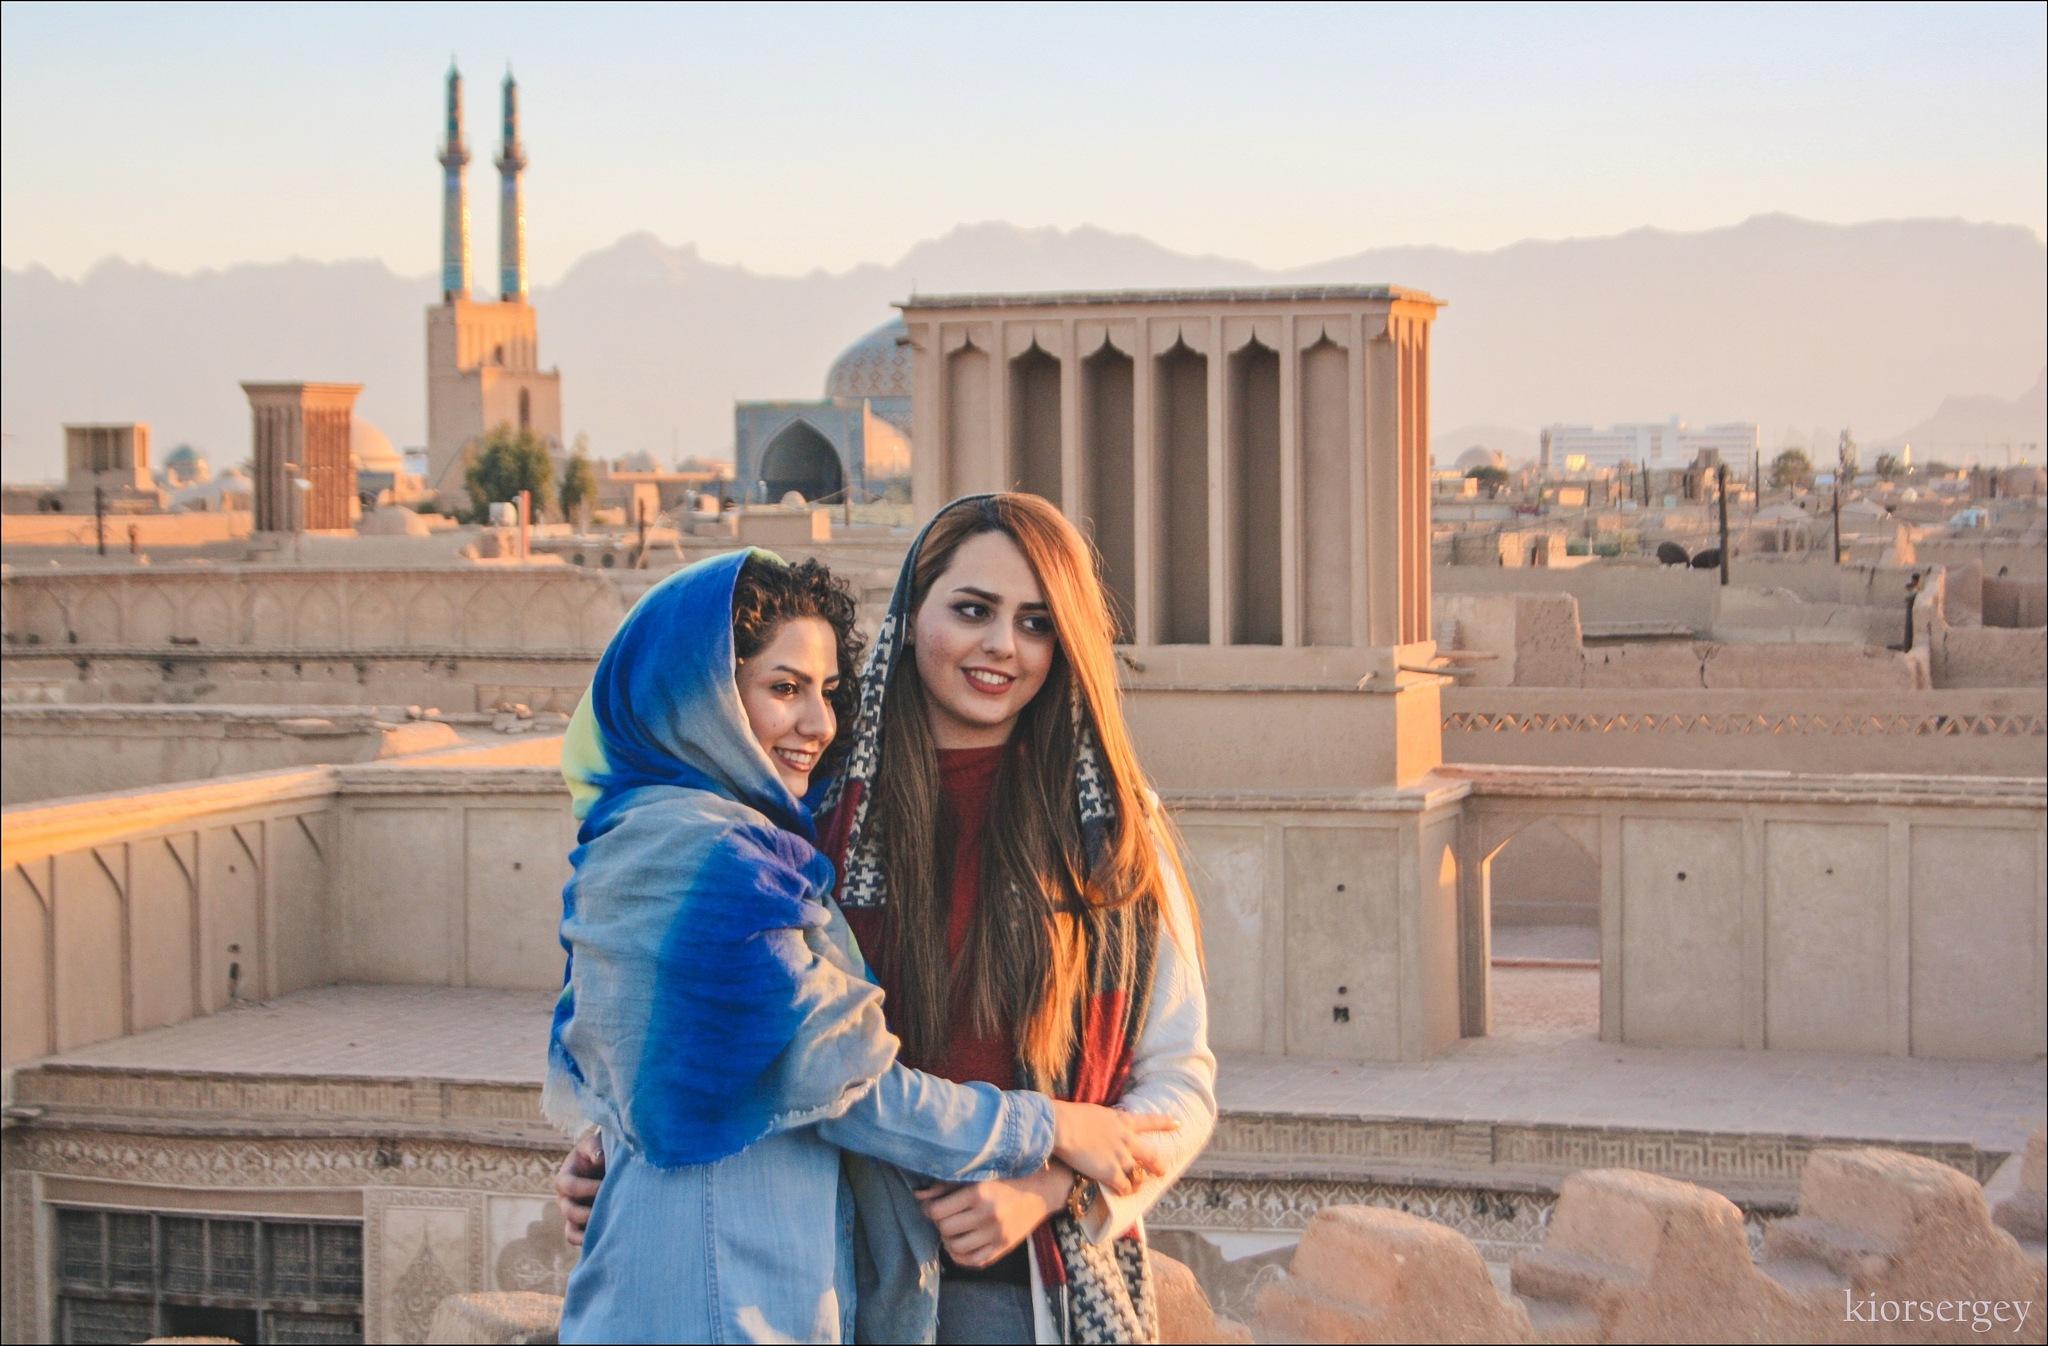 Yazd, Iran by Kior Sergey